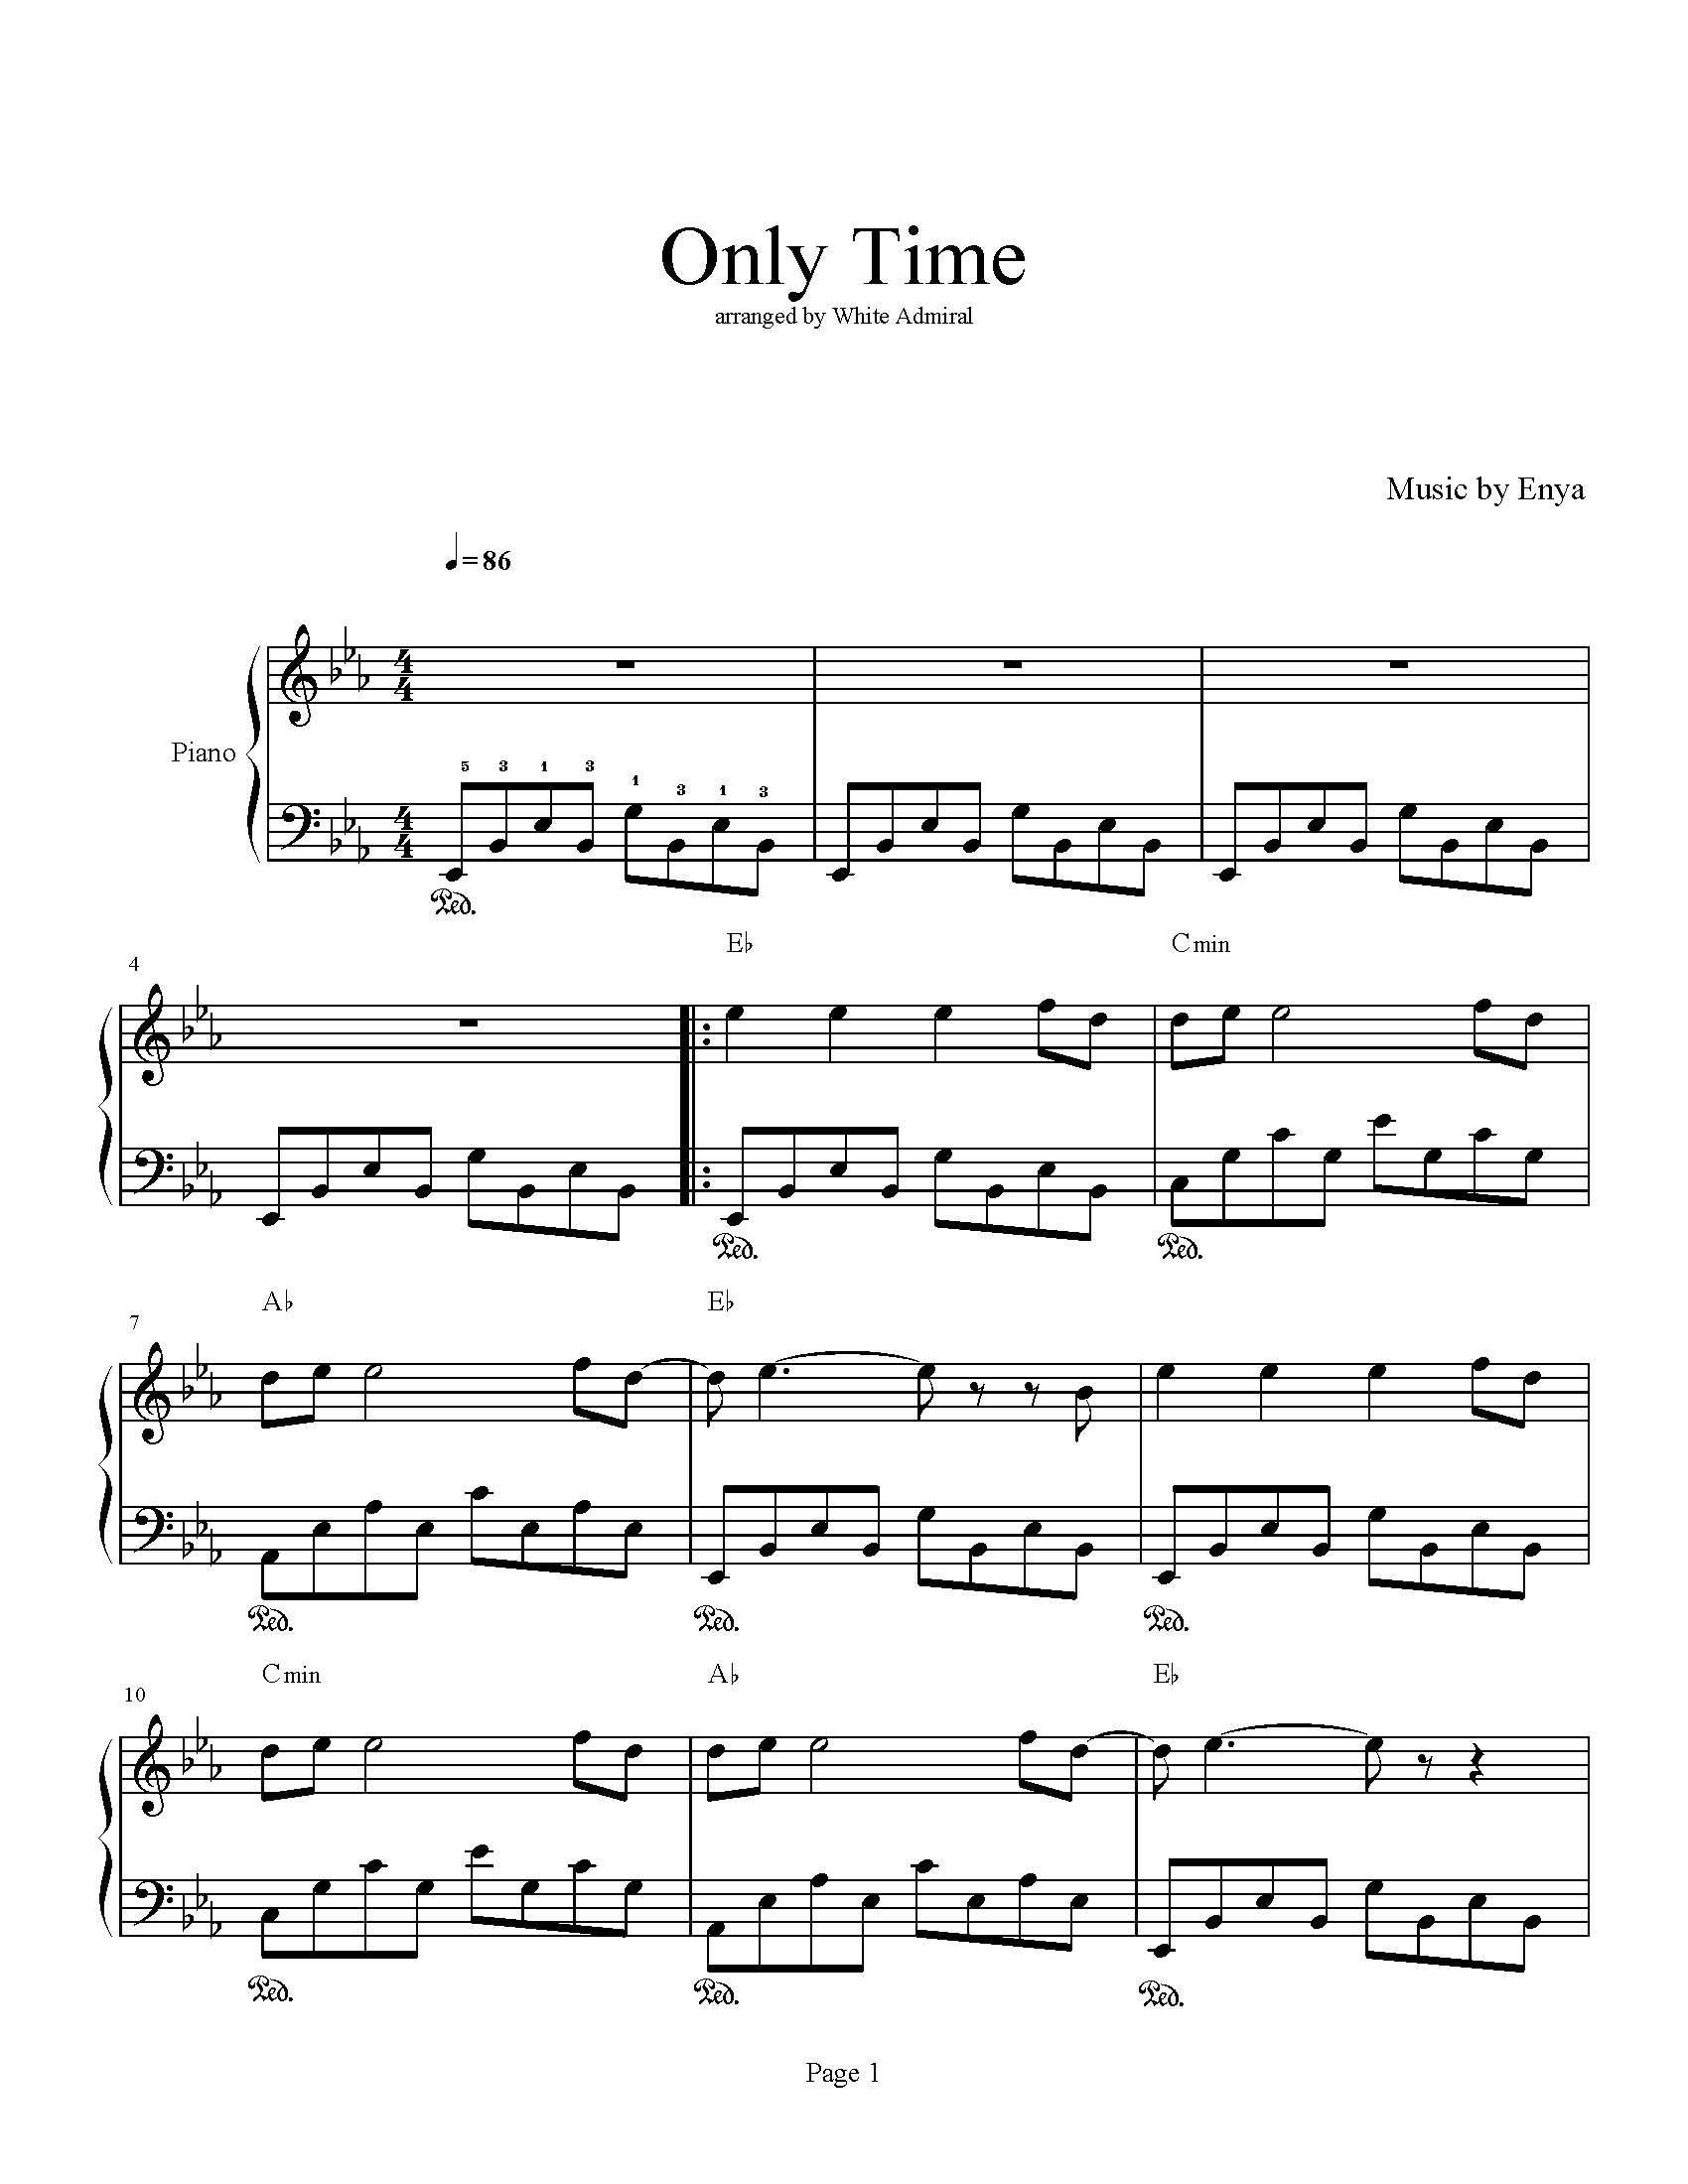 Only Time Enya Piano Plateau Sheet Music Sheet Music